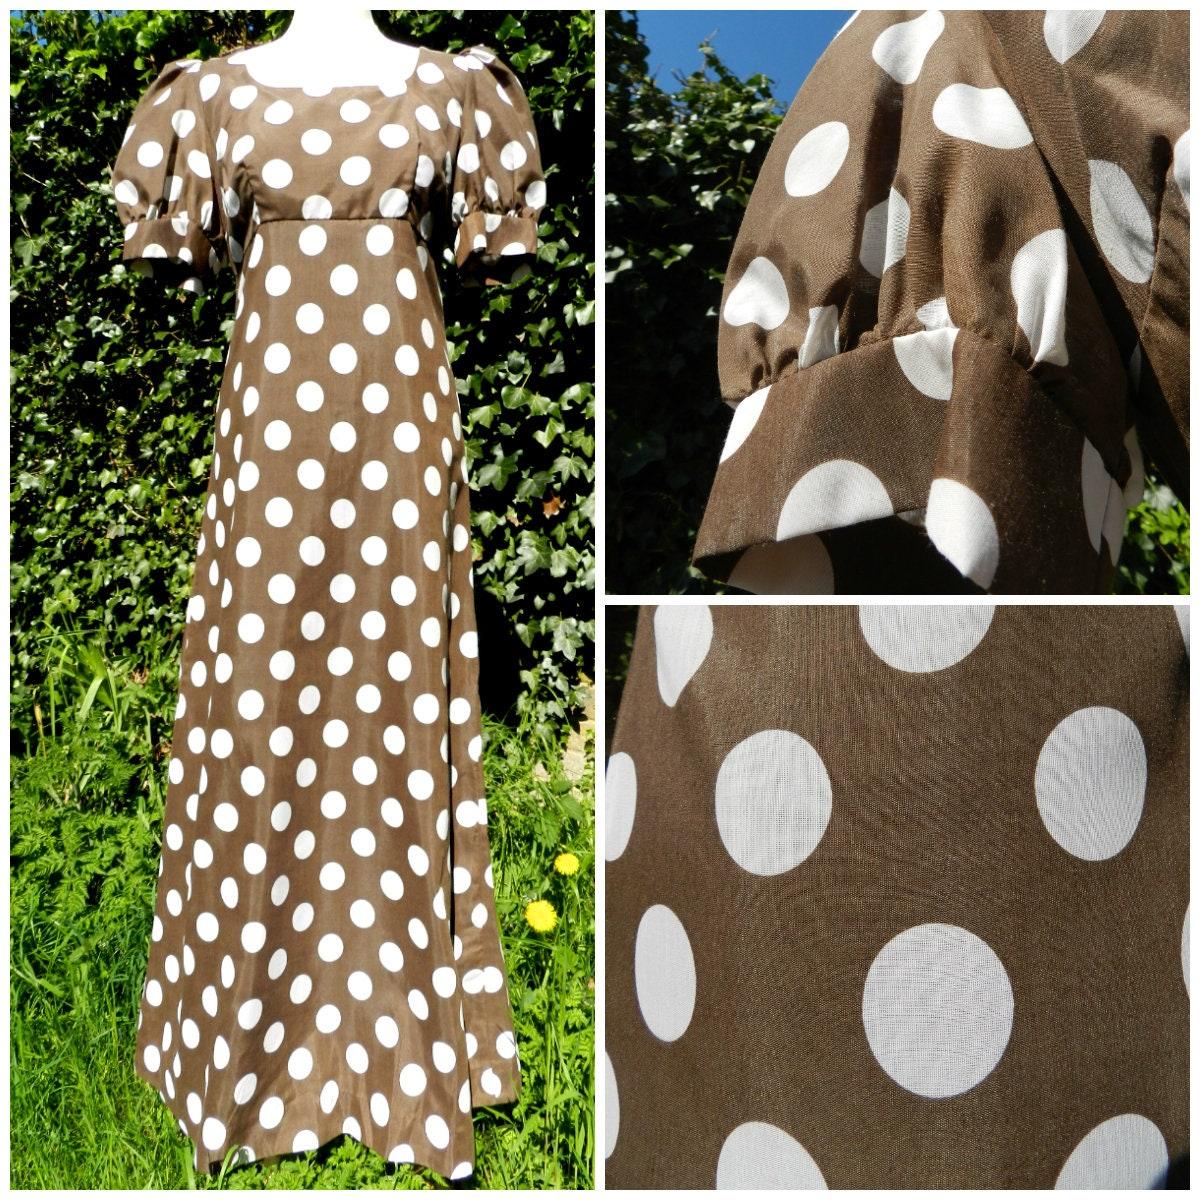 60s MARION DONALDSON maxi dress regency EMPIRE waist puff sleeves dotty polka dot brown white print u.k. 12  14 M